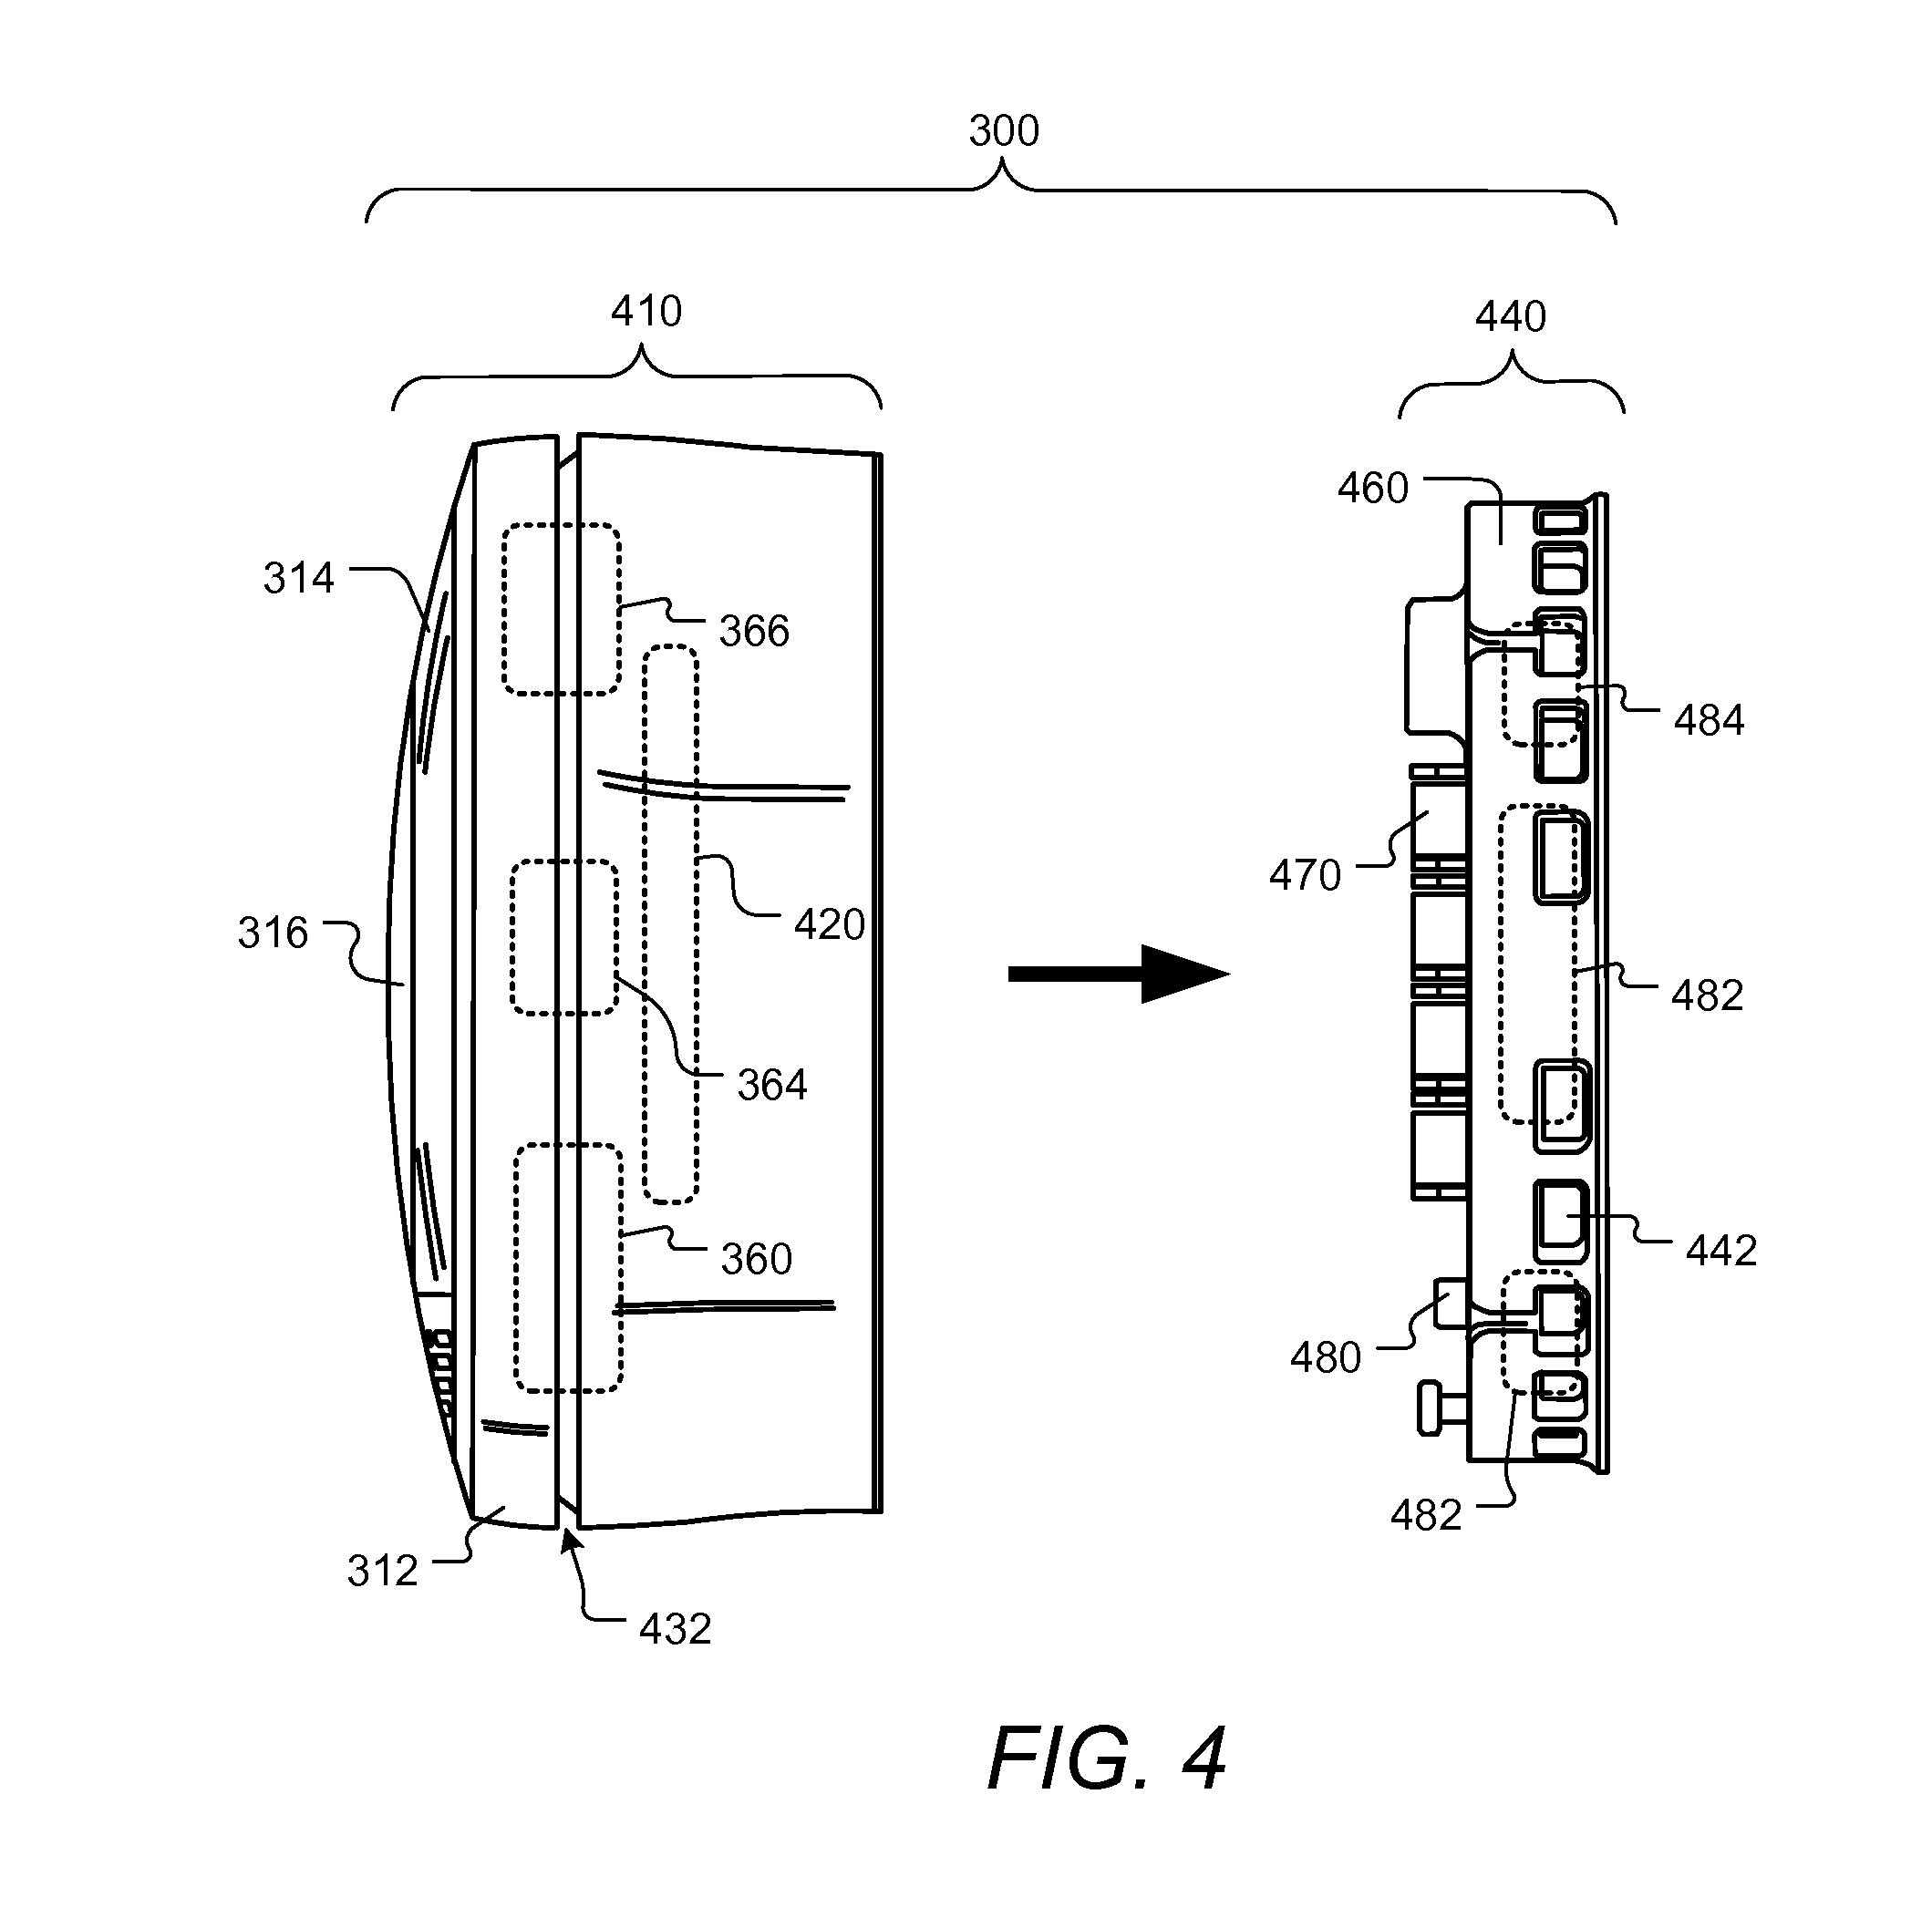 copeland wiring diagram home theater for compressor board 580 0041 00